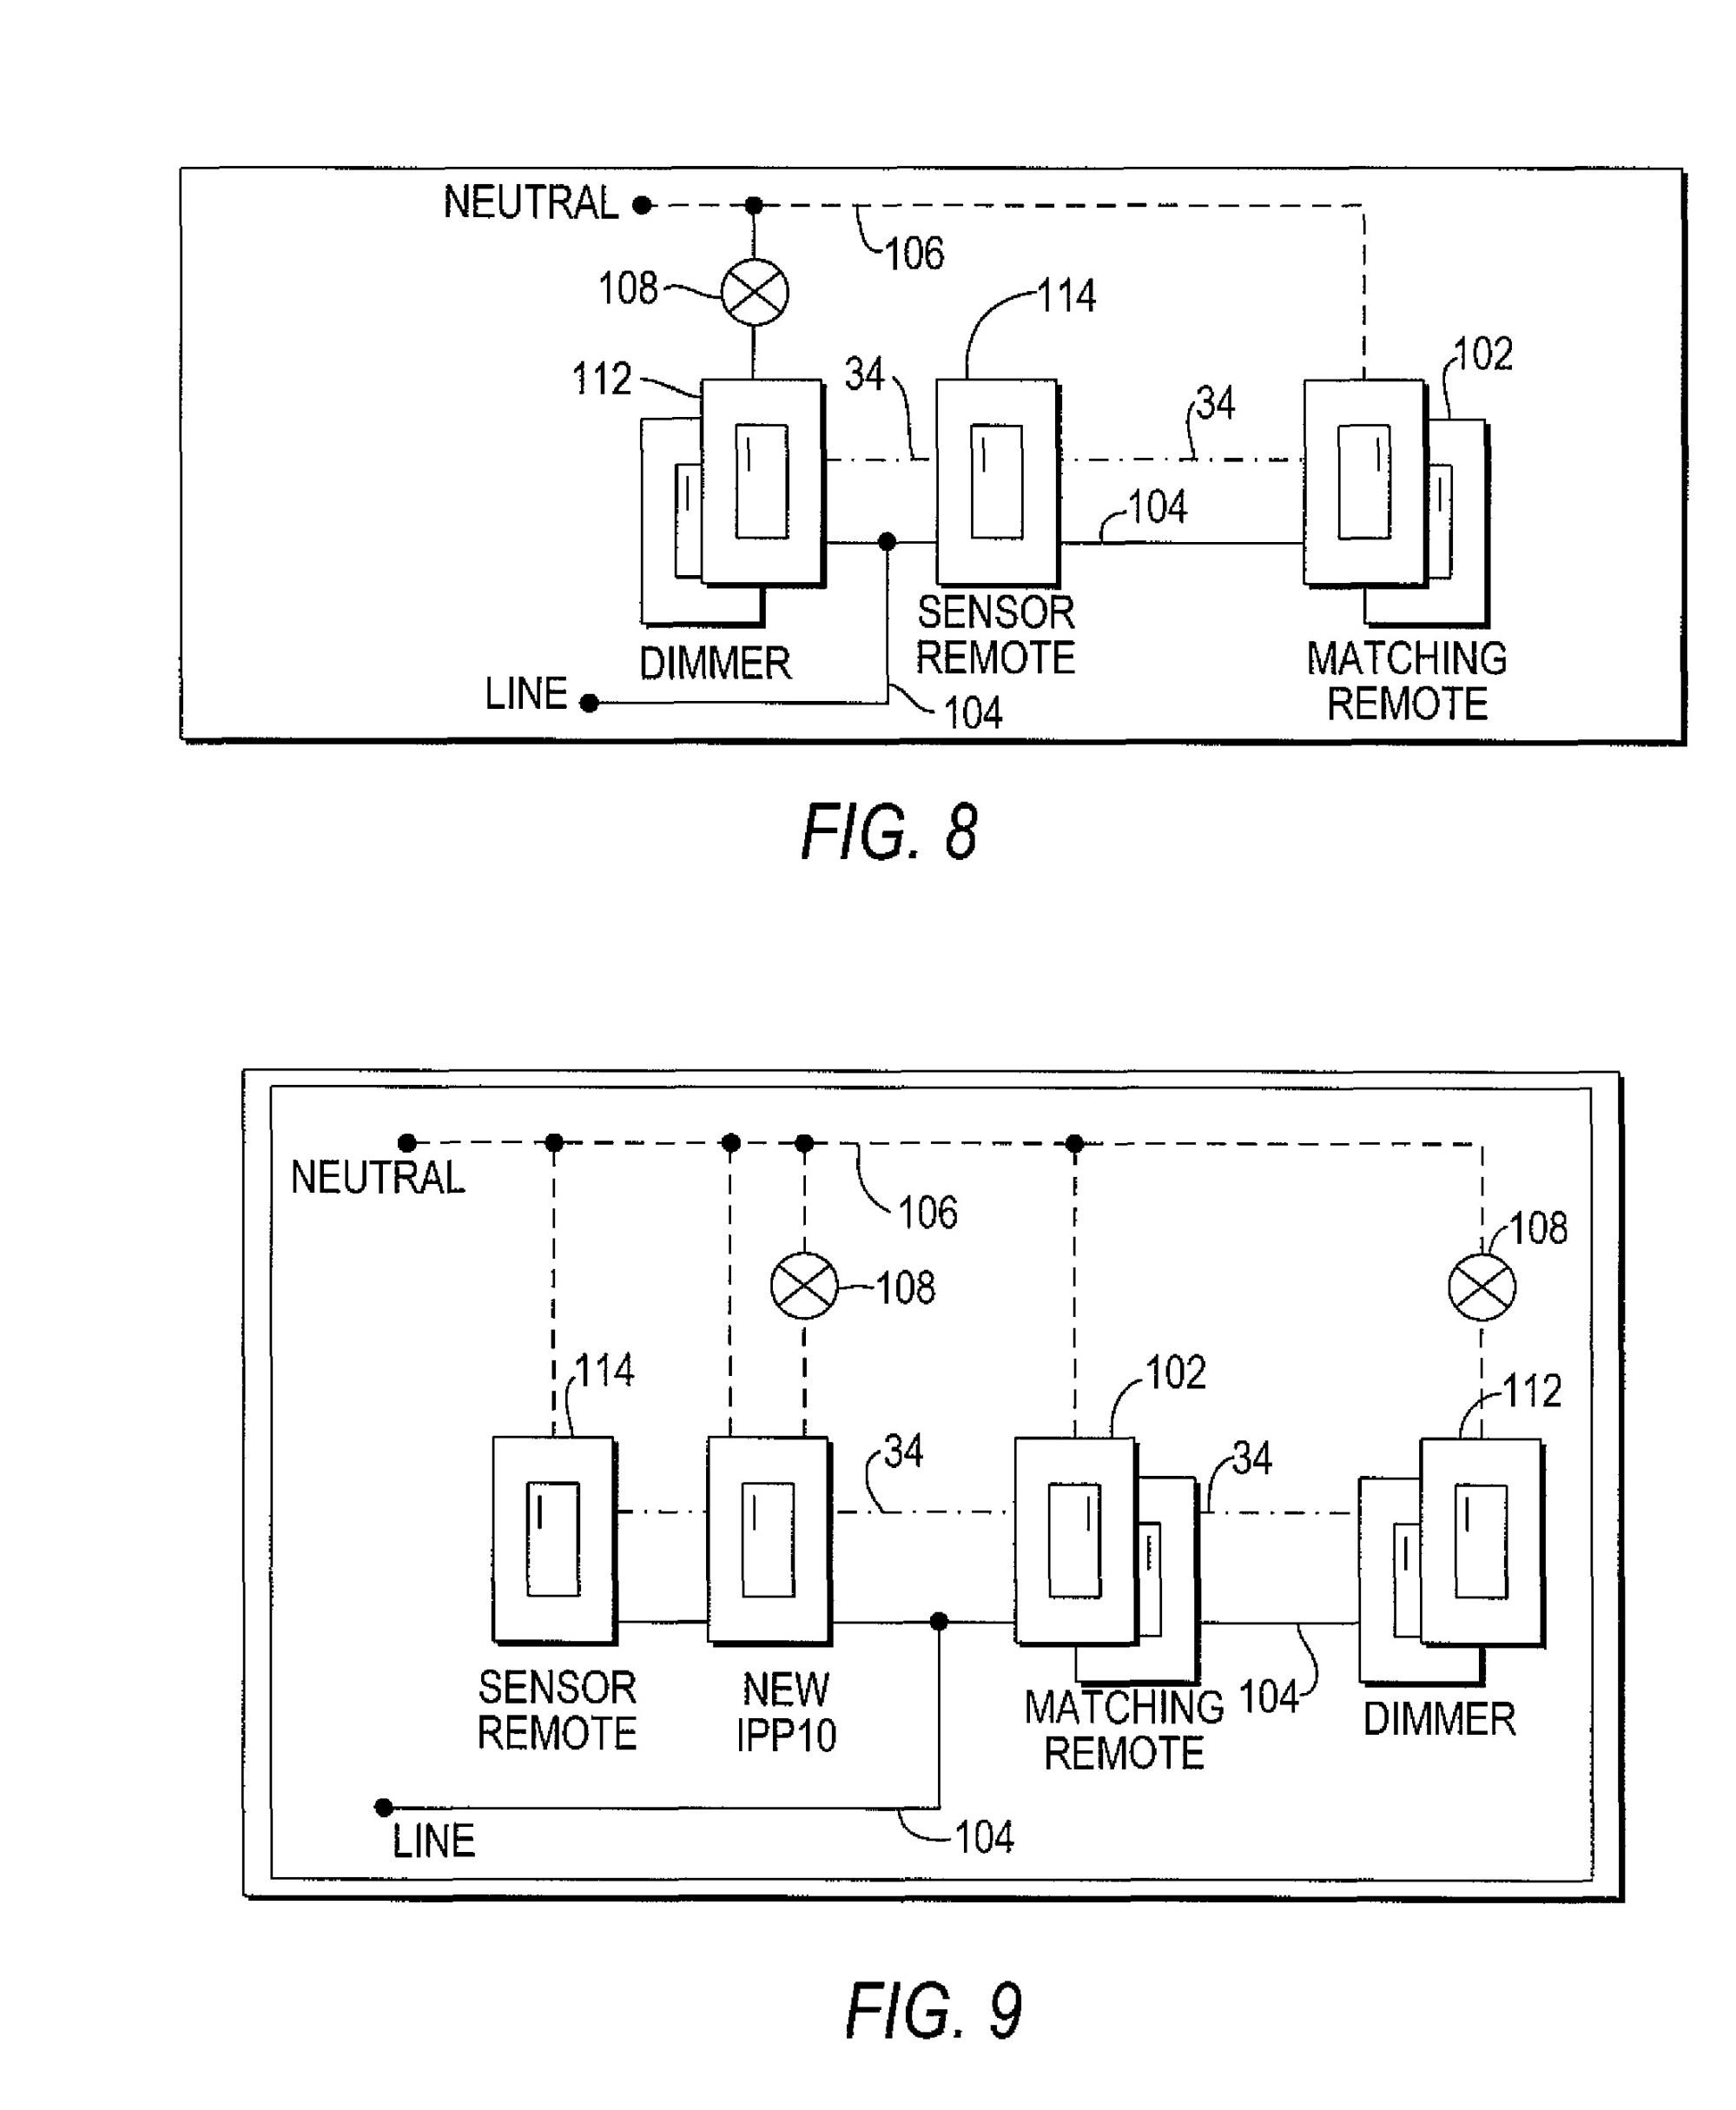 hight resolution of lutron mar wiring diagram guide about wiring diagram lutron ma r wiring diagram